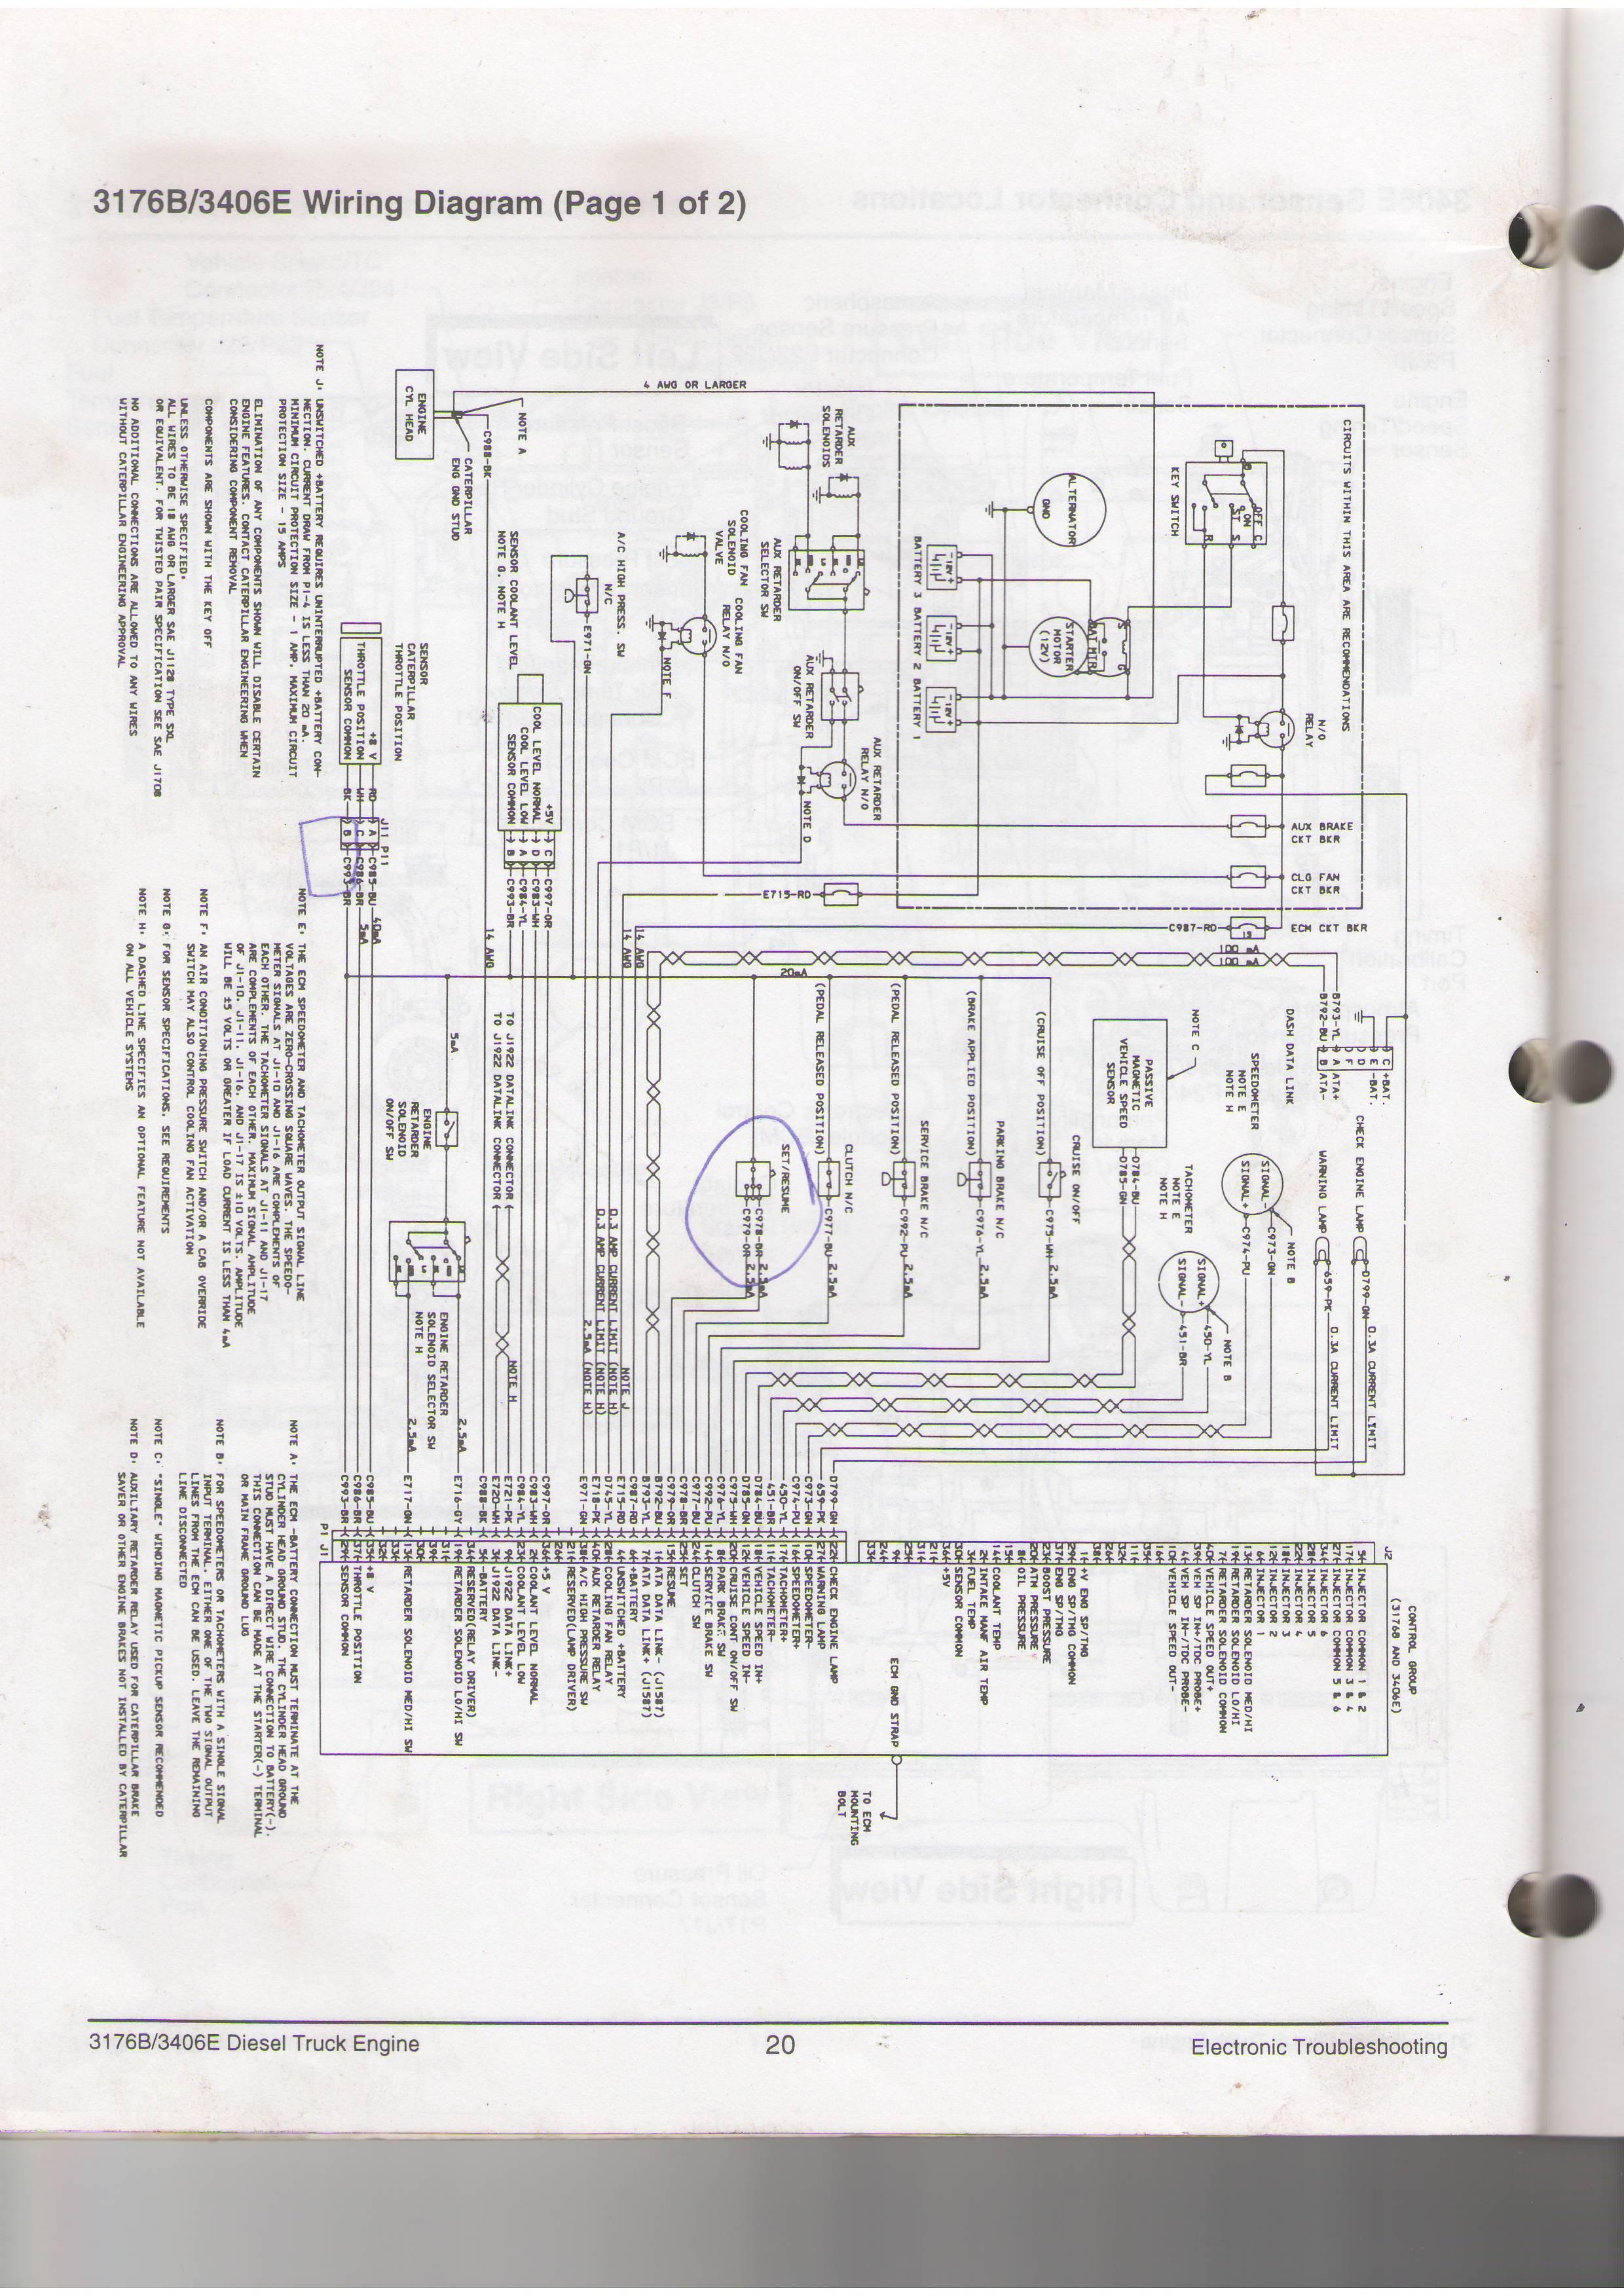 C12 Wiring Diagram | Wiring Library - Cat C15 Ecm Wiring Diagram